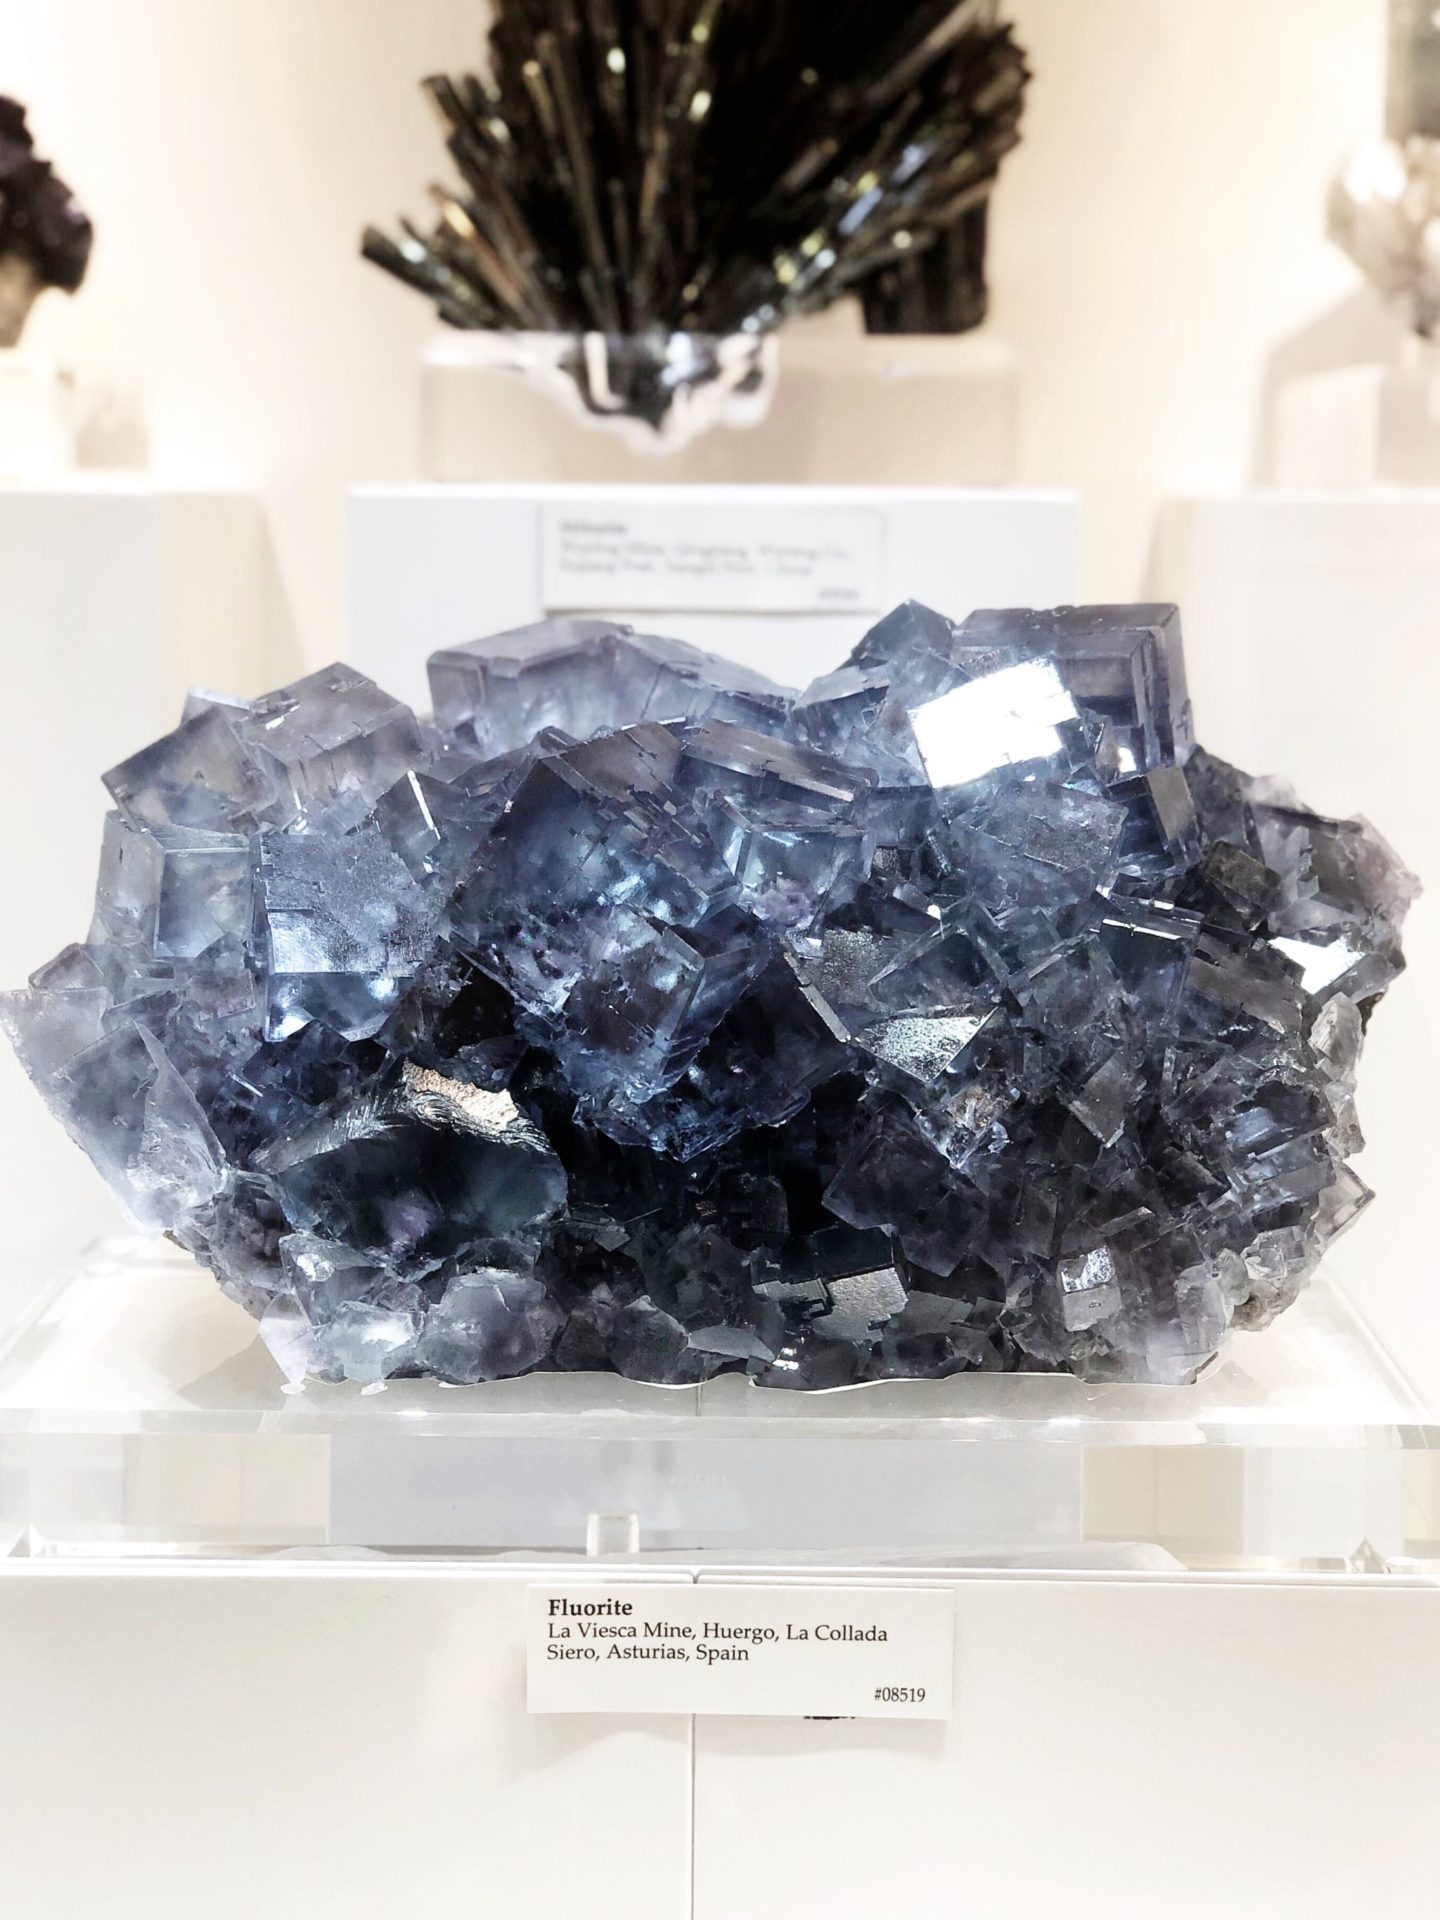 Astro West Fine Minerals Galery , Empress Malas Etsy, Mala Bead Bracelets Canada, Mala Bead Bracelet Inspiration, Mala Bead Bracelets Etsy